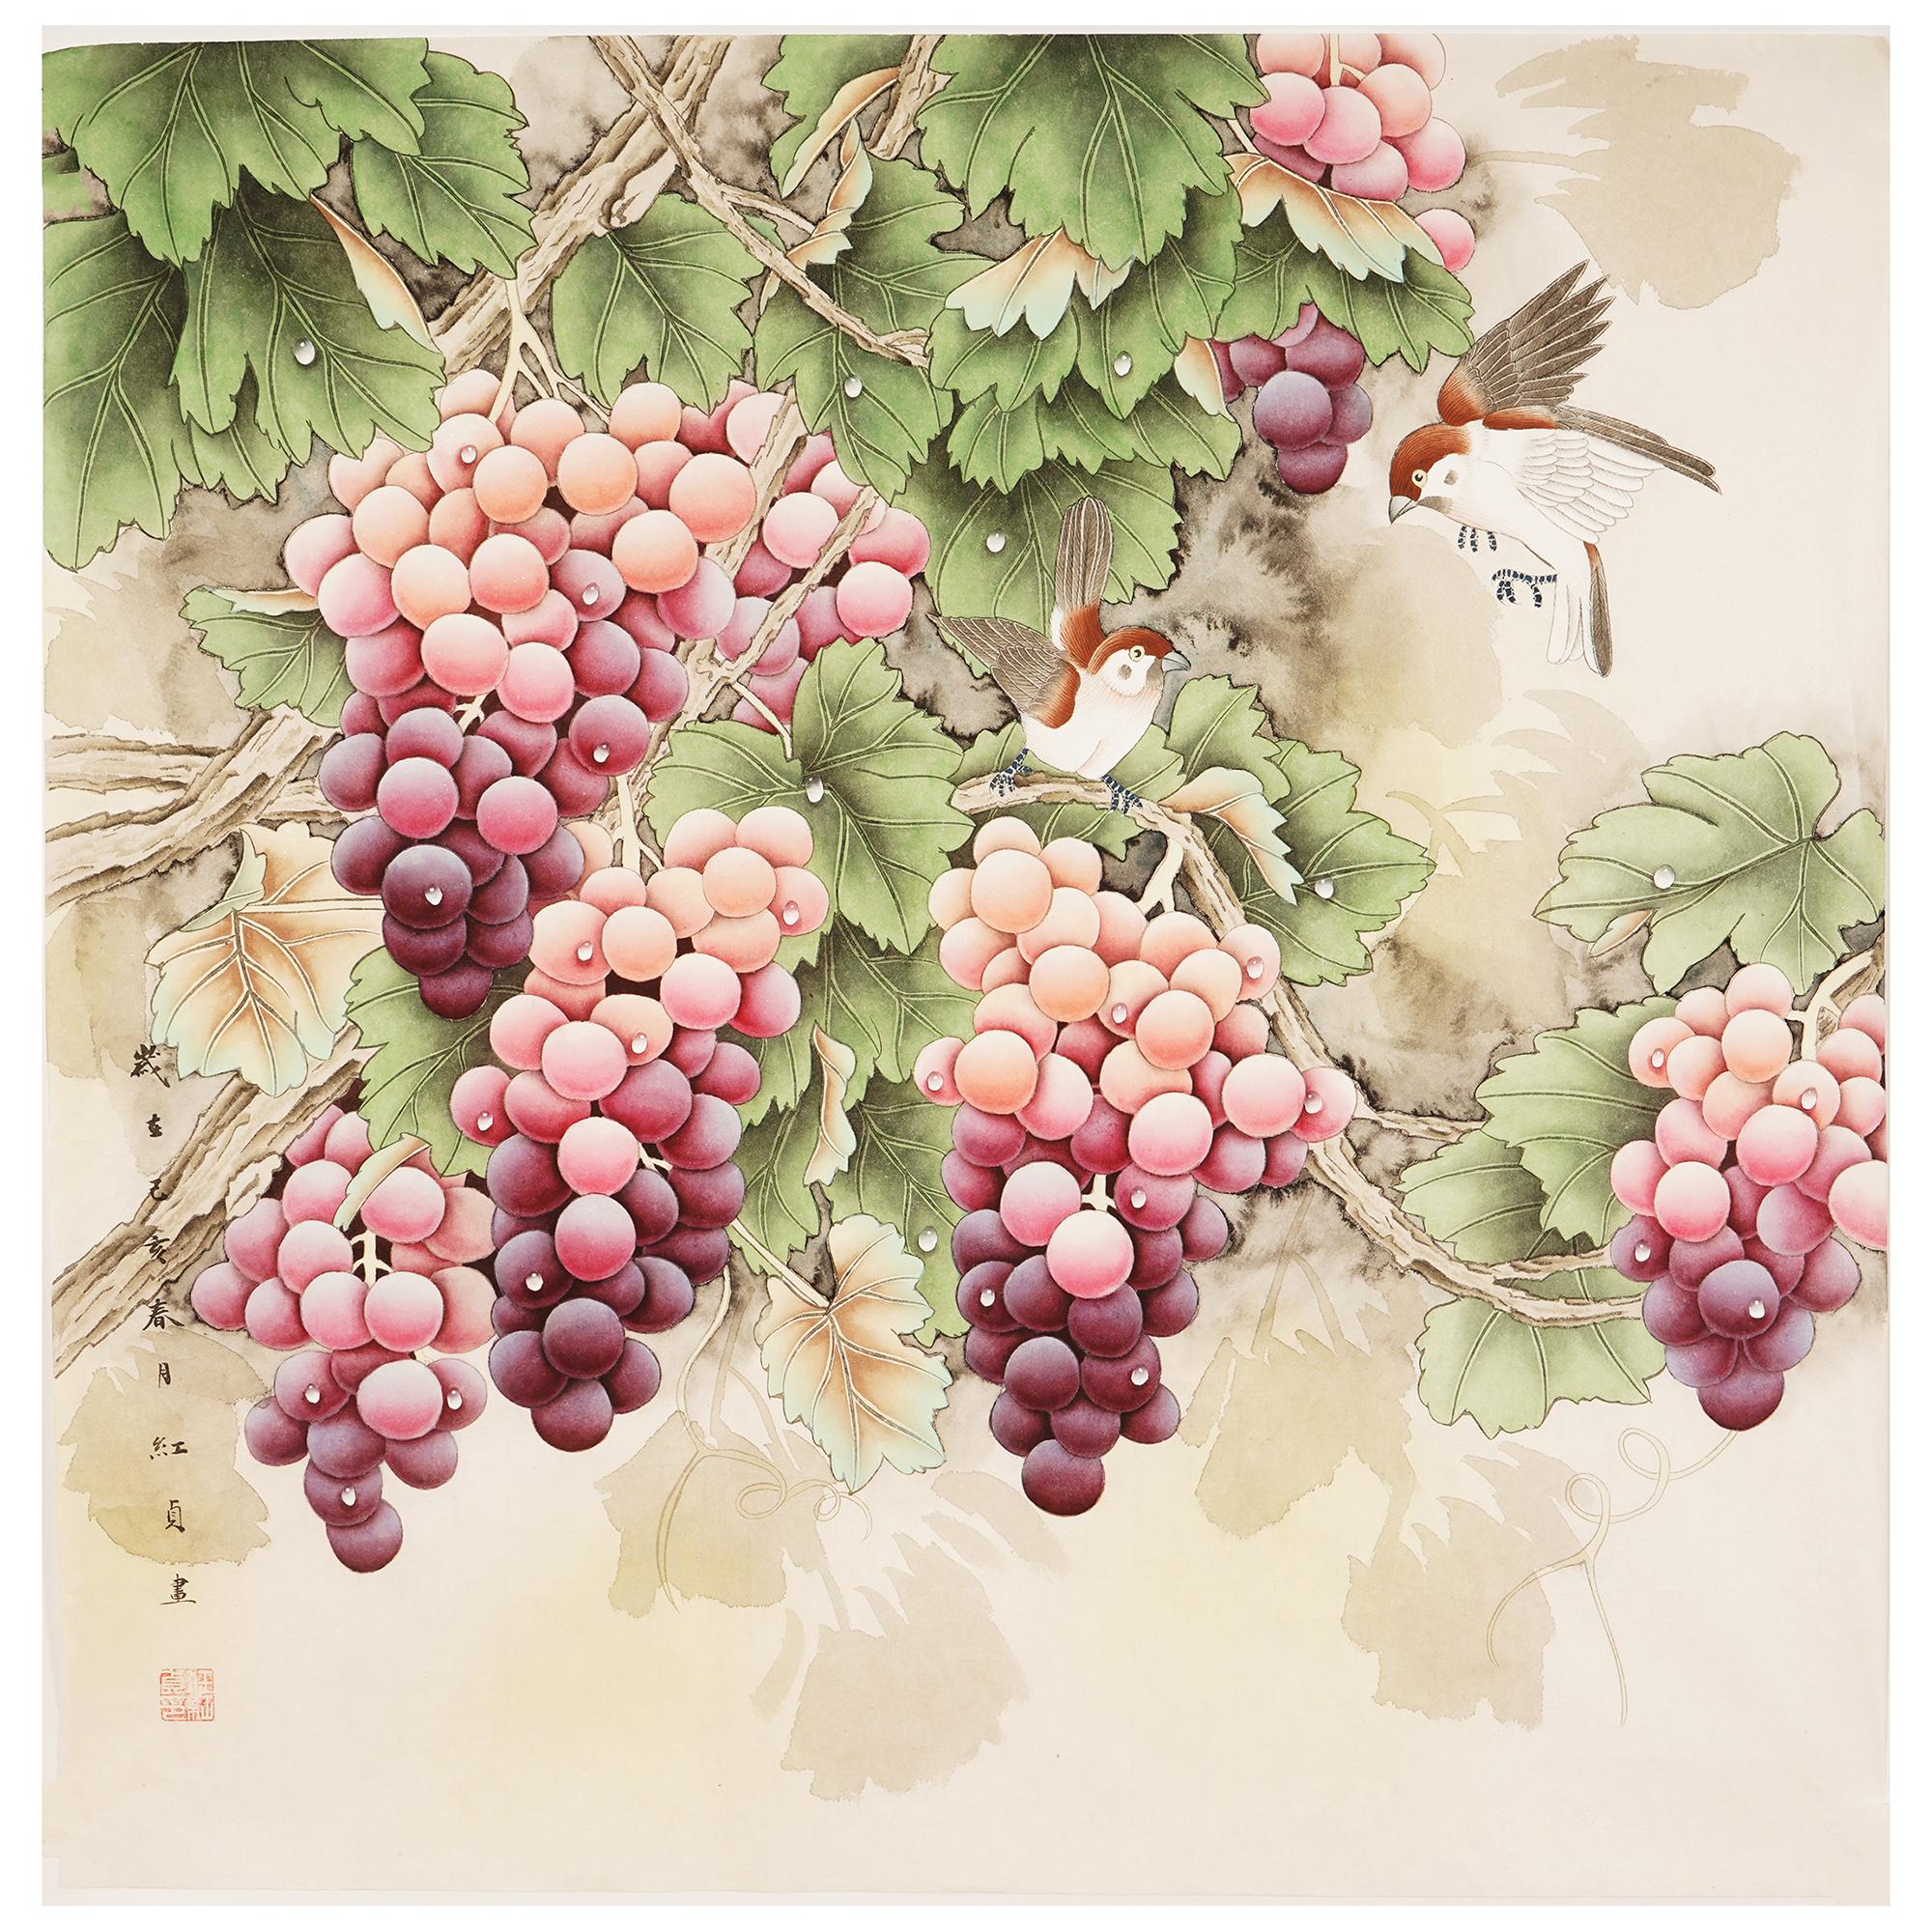 Китайская живопись Артикул 592592276179